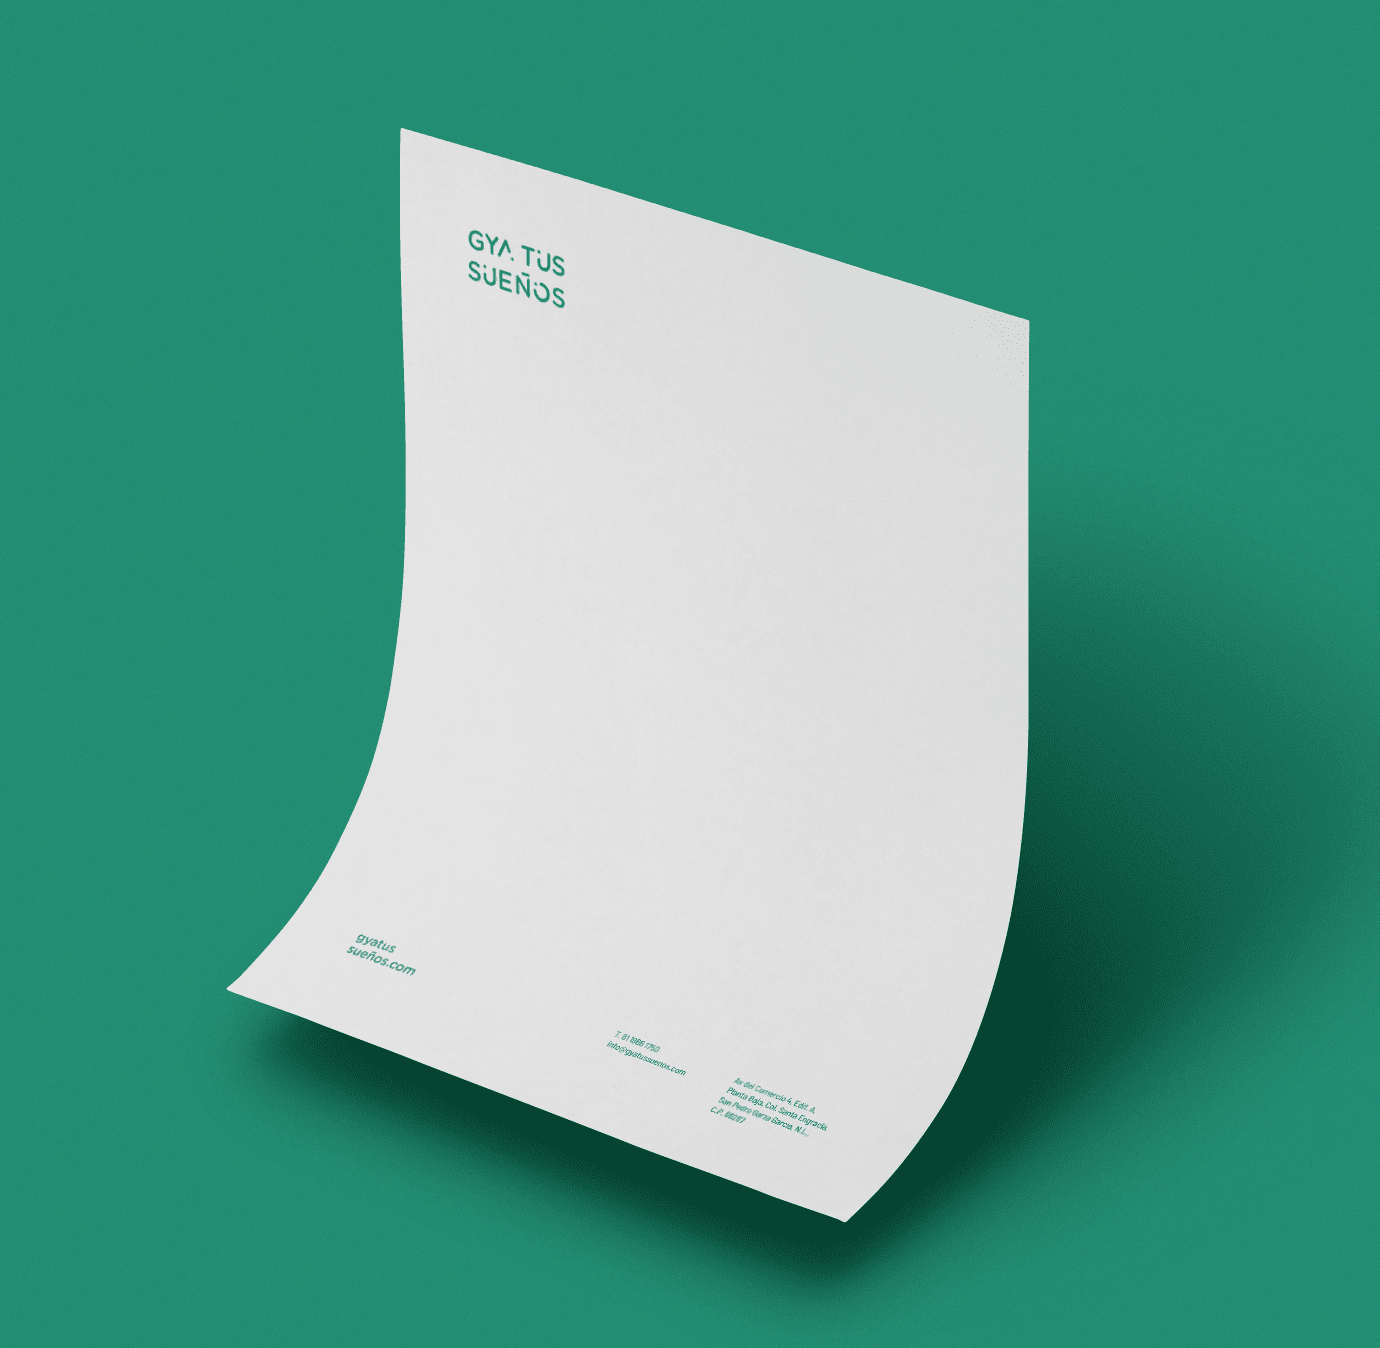 Letter_gya-yoenpaperland